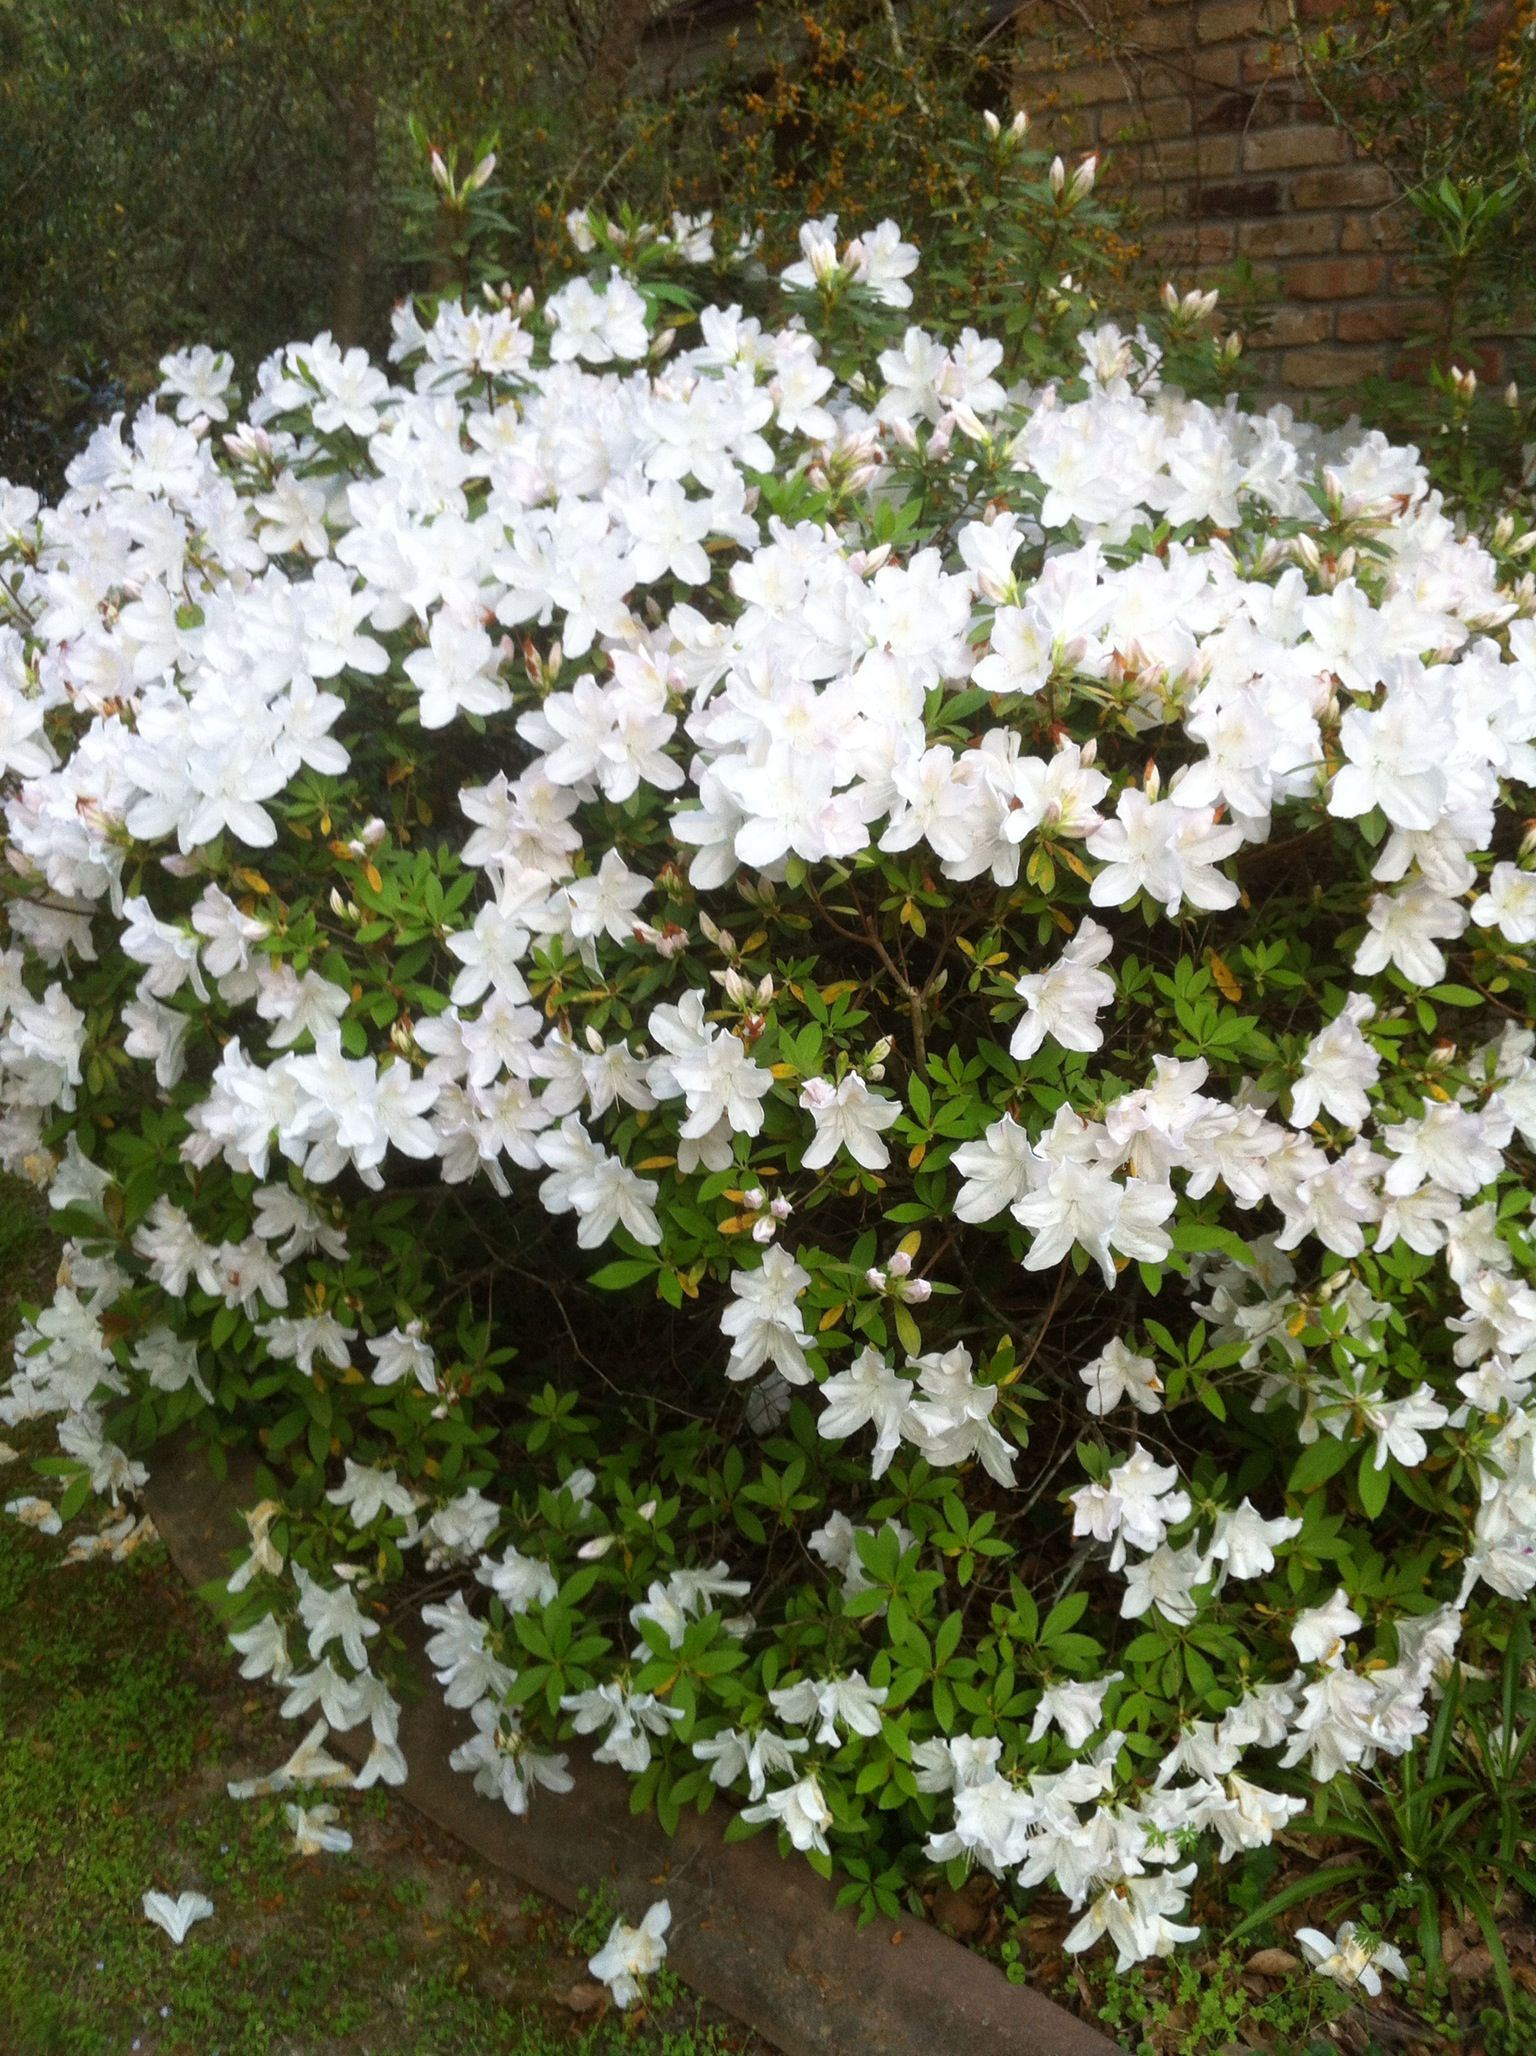 I Wanna Do White Azaleas On The Front Of The House Garden Design Plans Butterfly Garden Design Azaleas